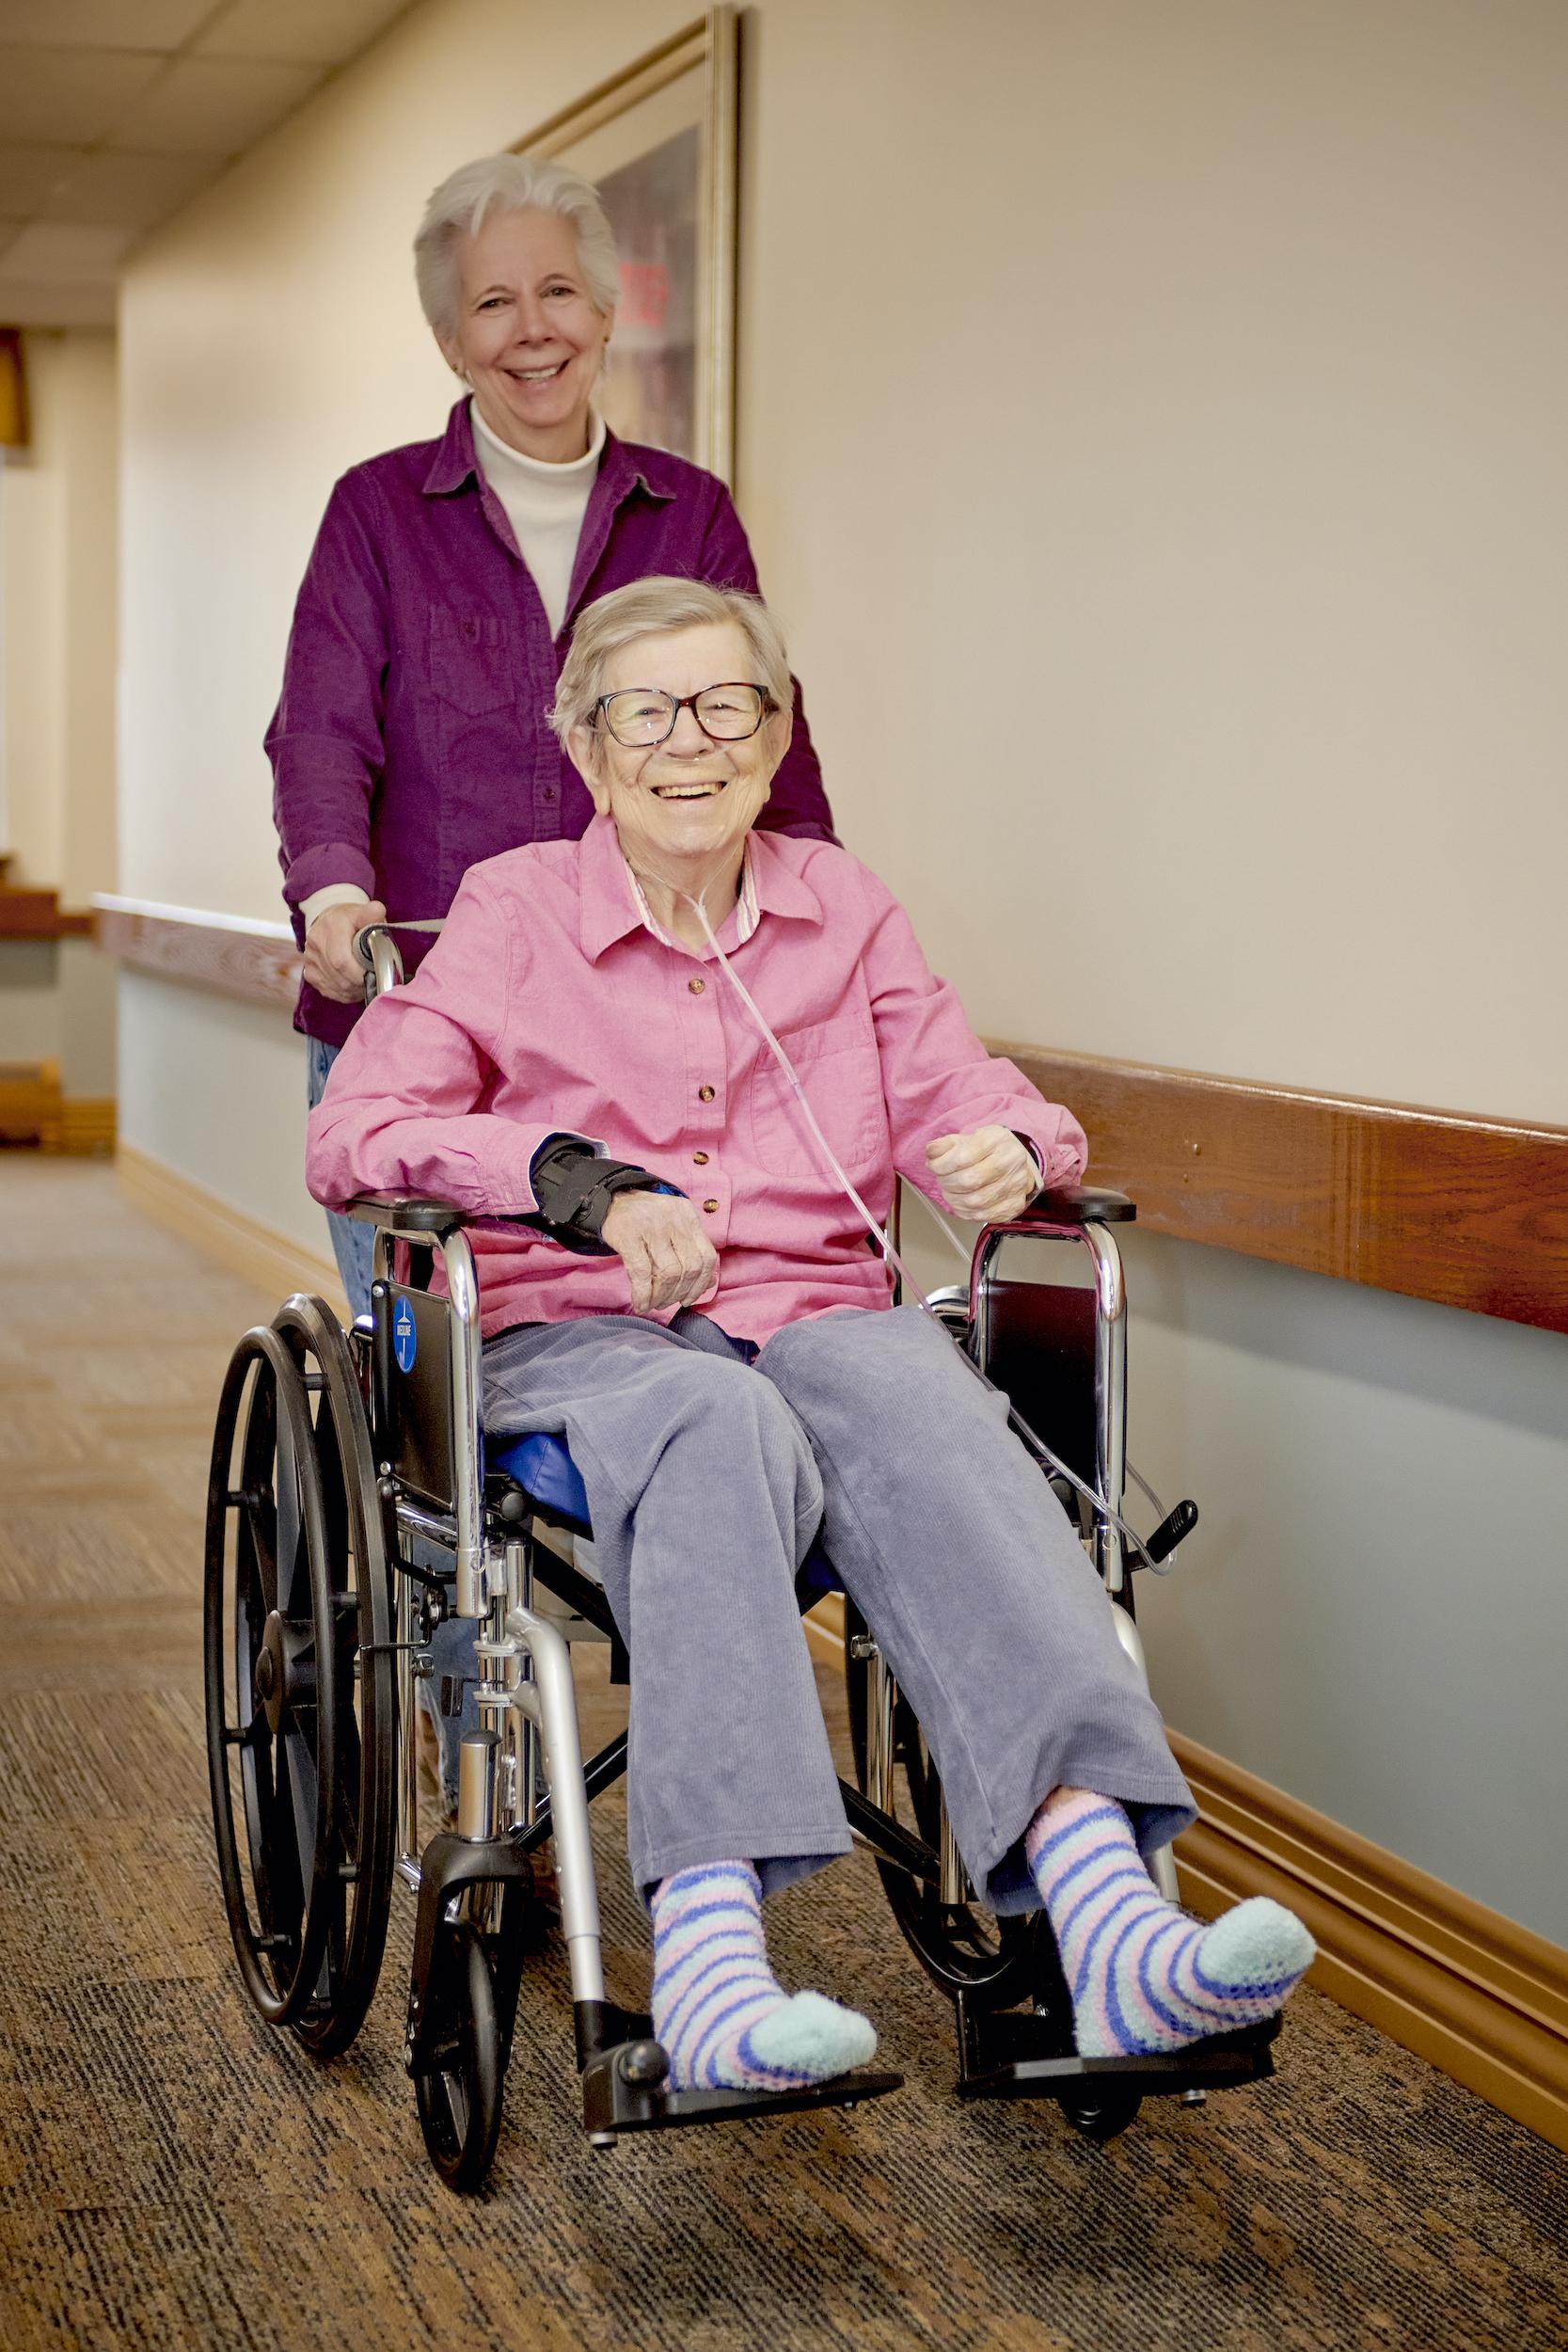 nursing home vs assisted living facility